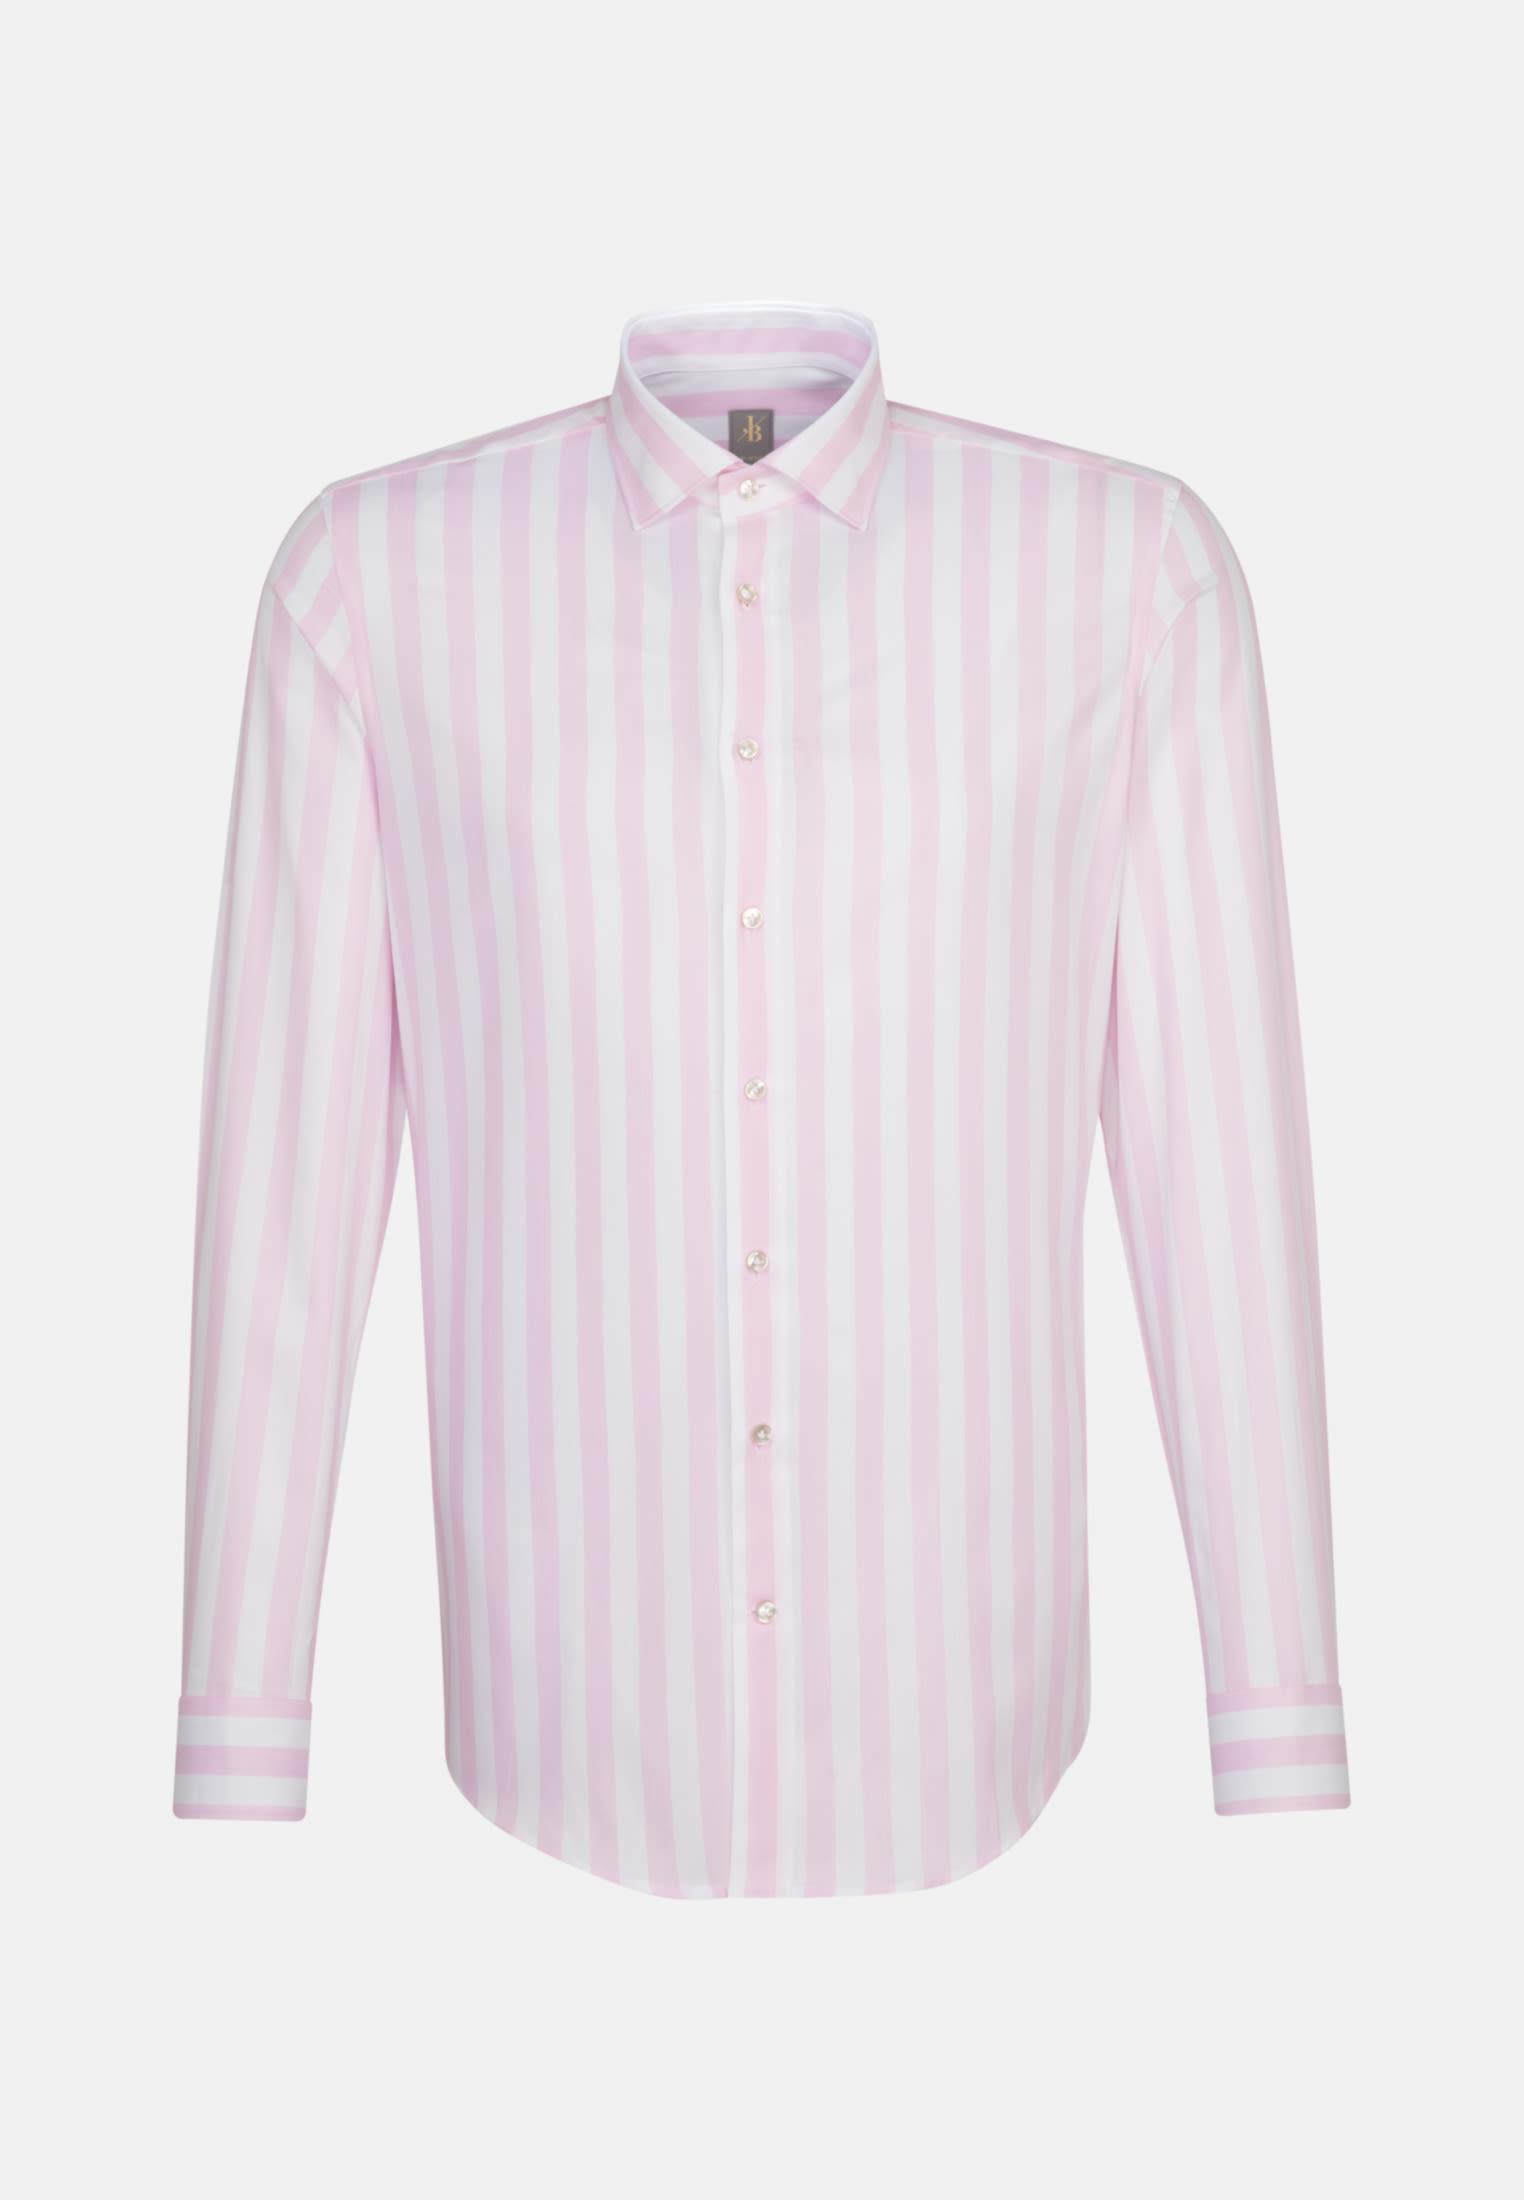 Oxford Business Hemd in Slim Fit mit Kentkragen in Rosa/Pink    Jacques Britt Onlineshop